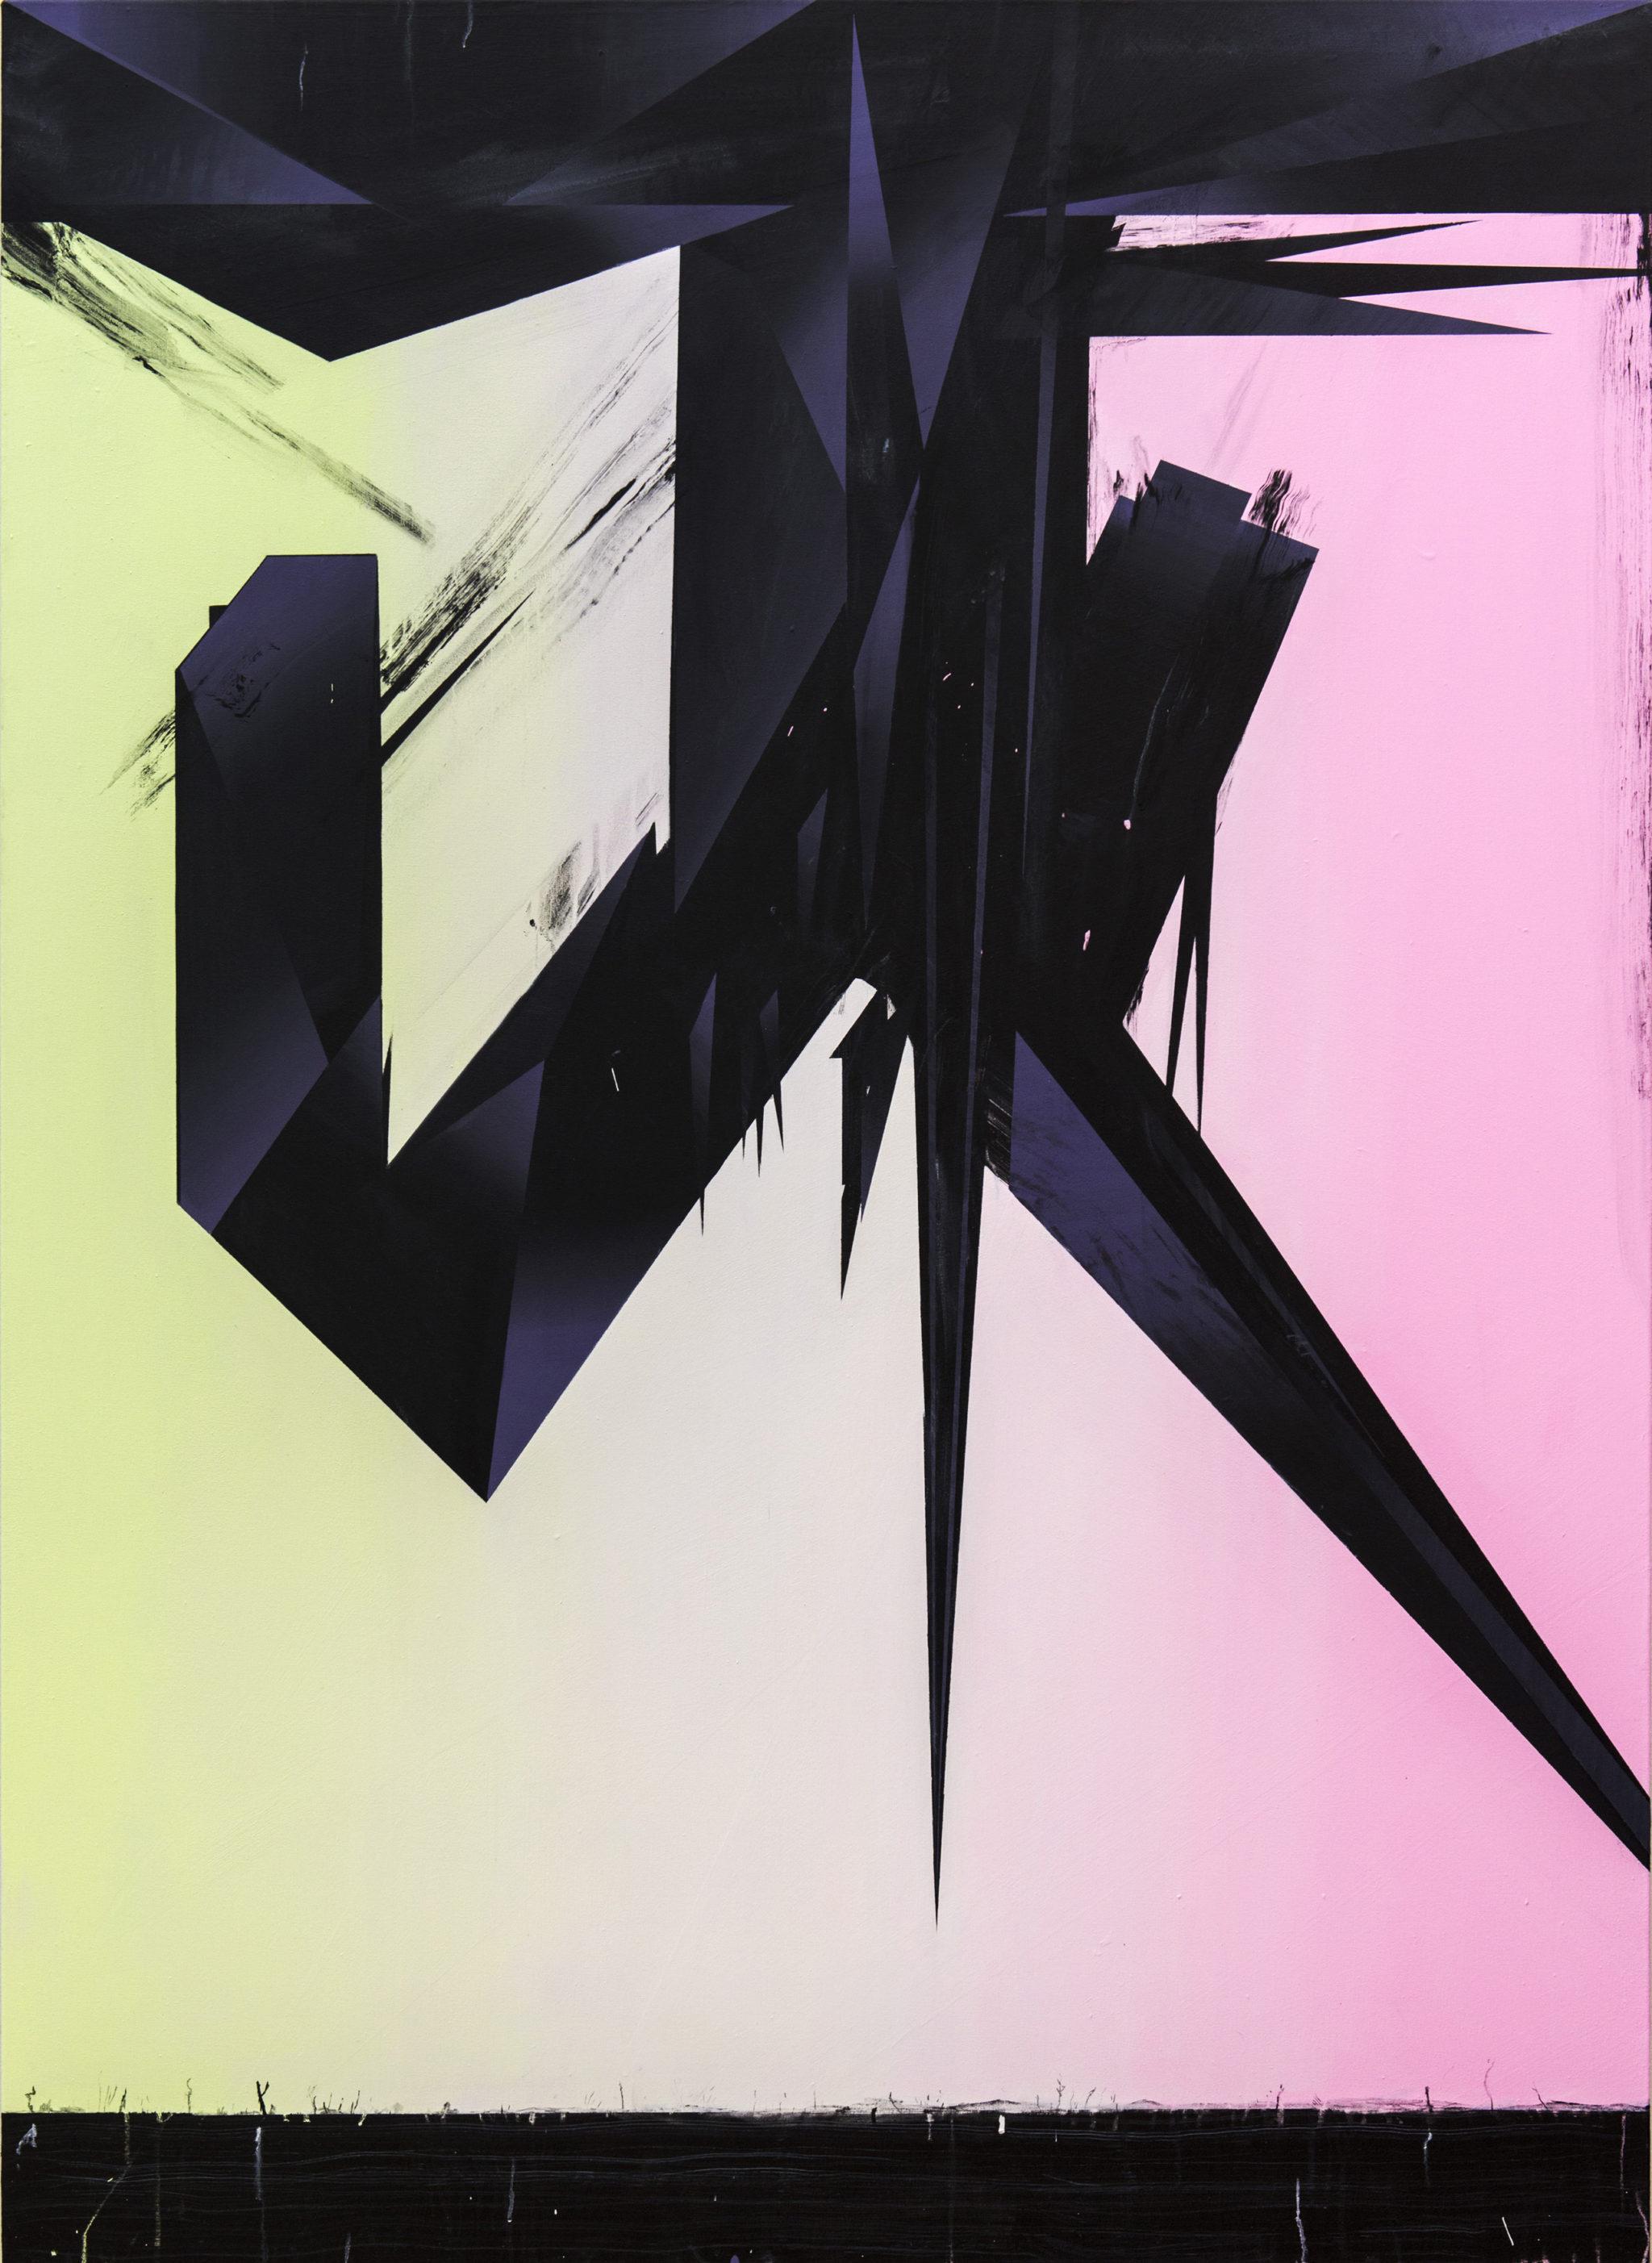 Phil Ashcroft, Cyclone (GP Version), acrylic on canvas, 175 x 126cm, 2012, photo Joe Plommer